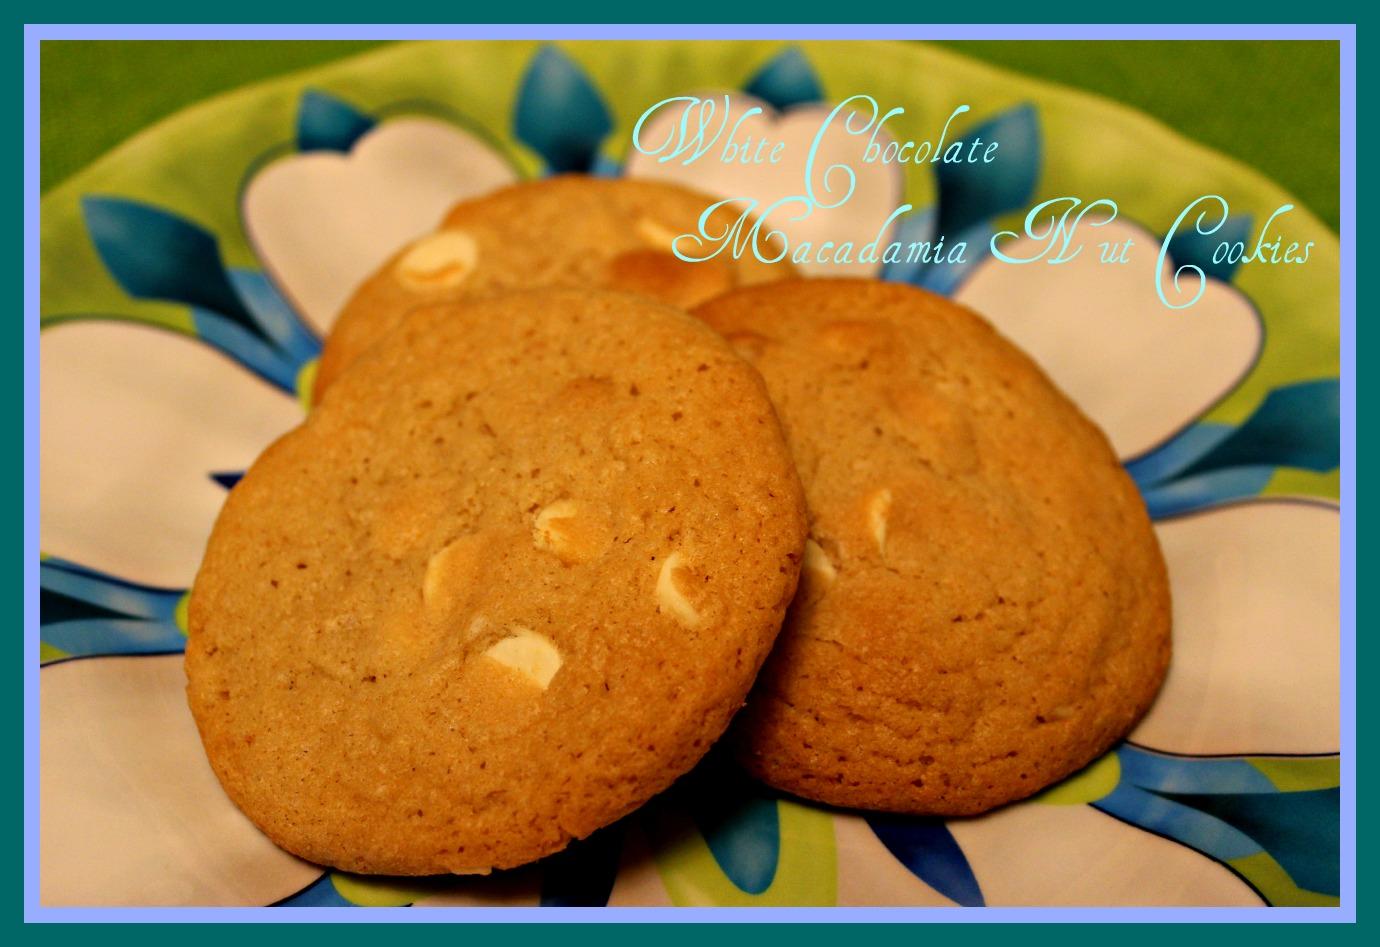 White Chocolate Macadamia Nut Cookies!